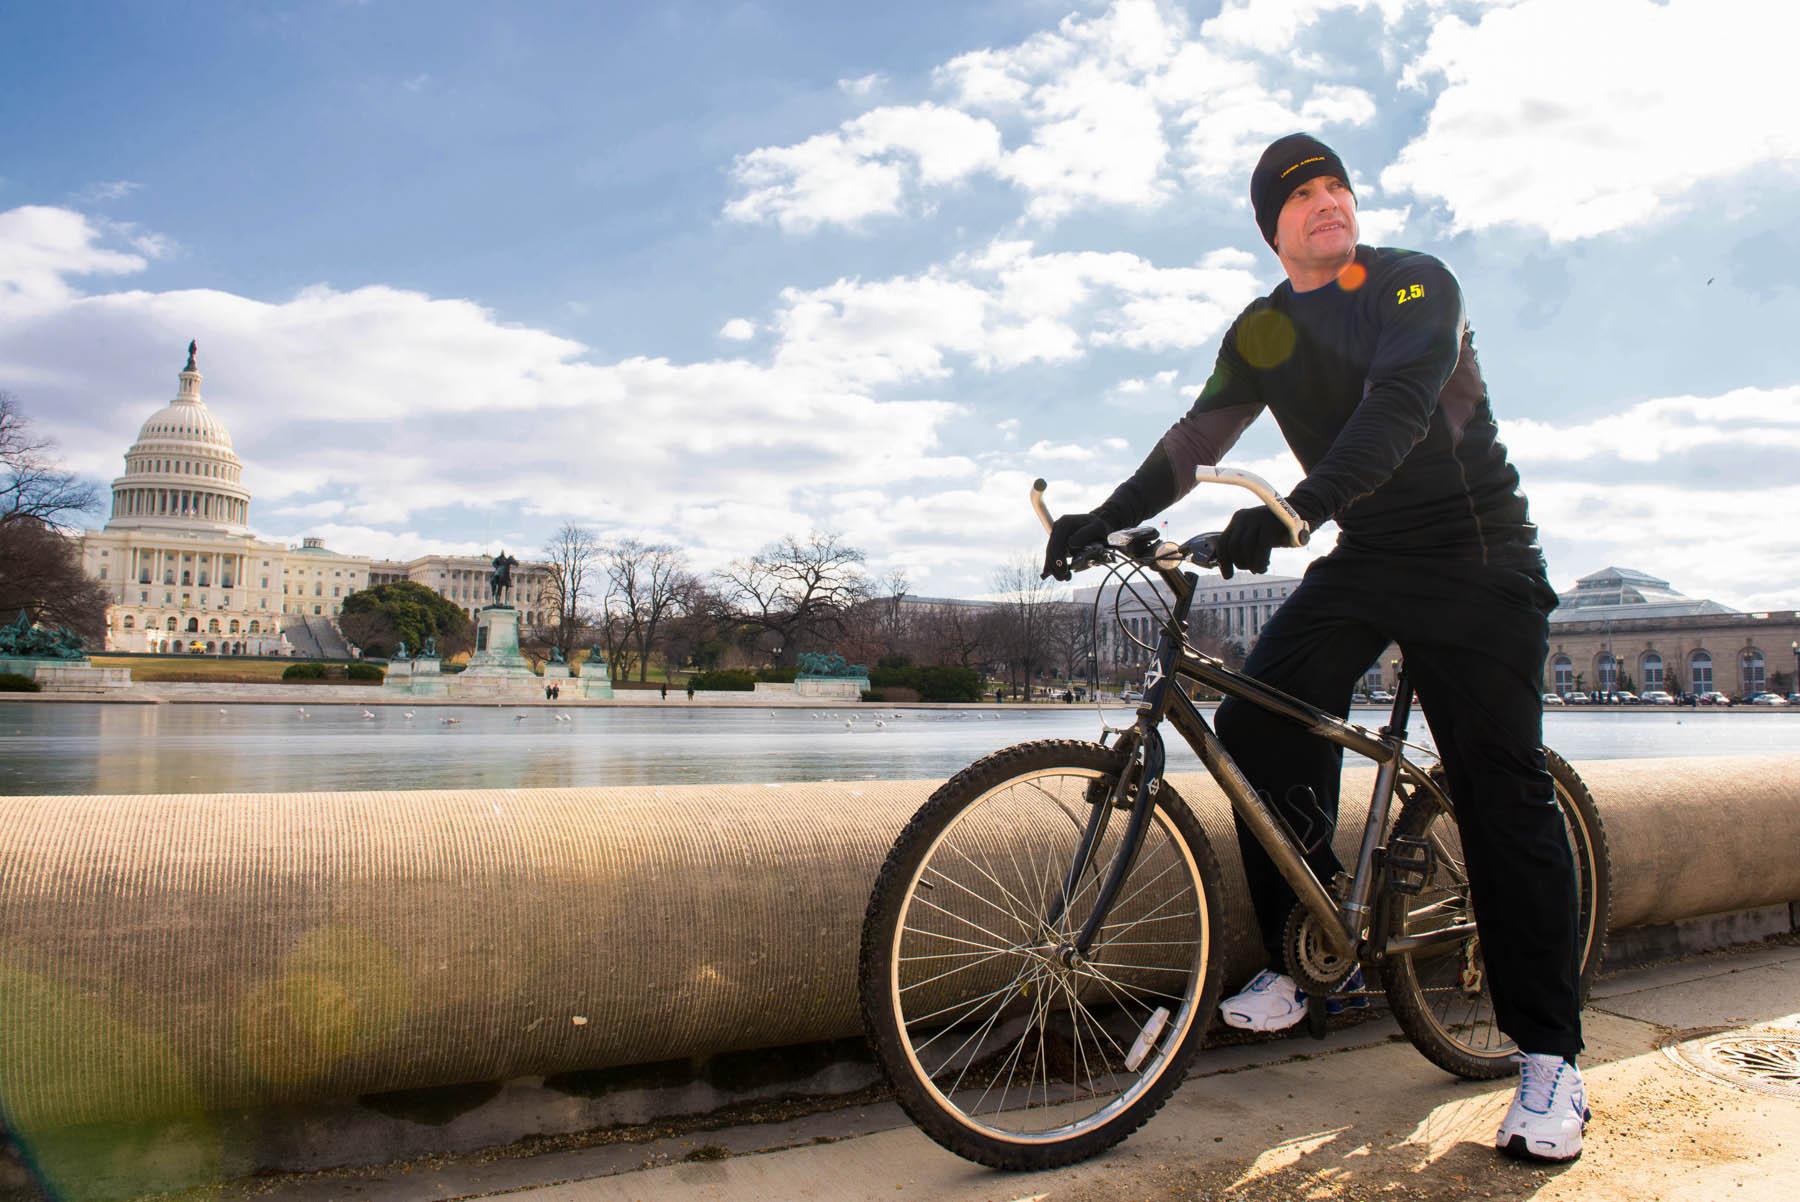 Capitol biking